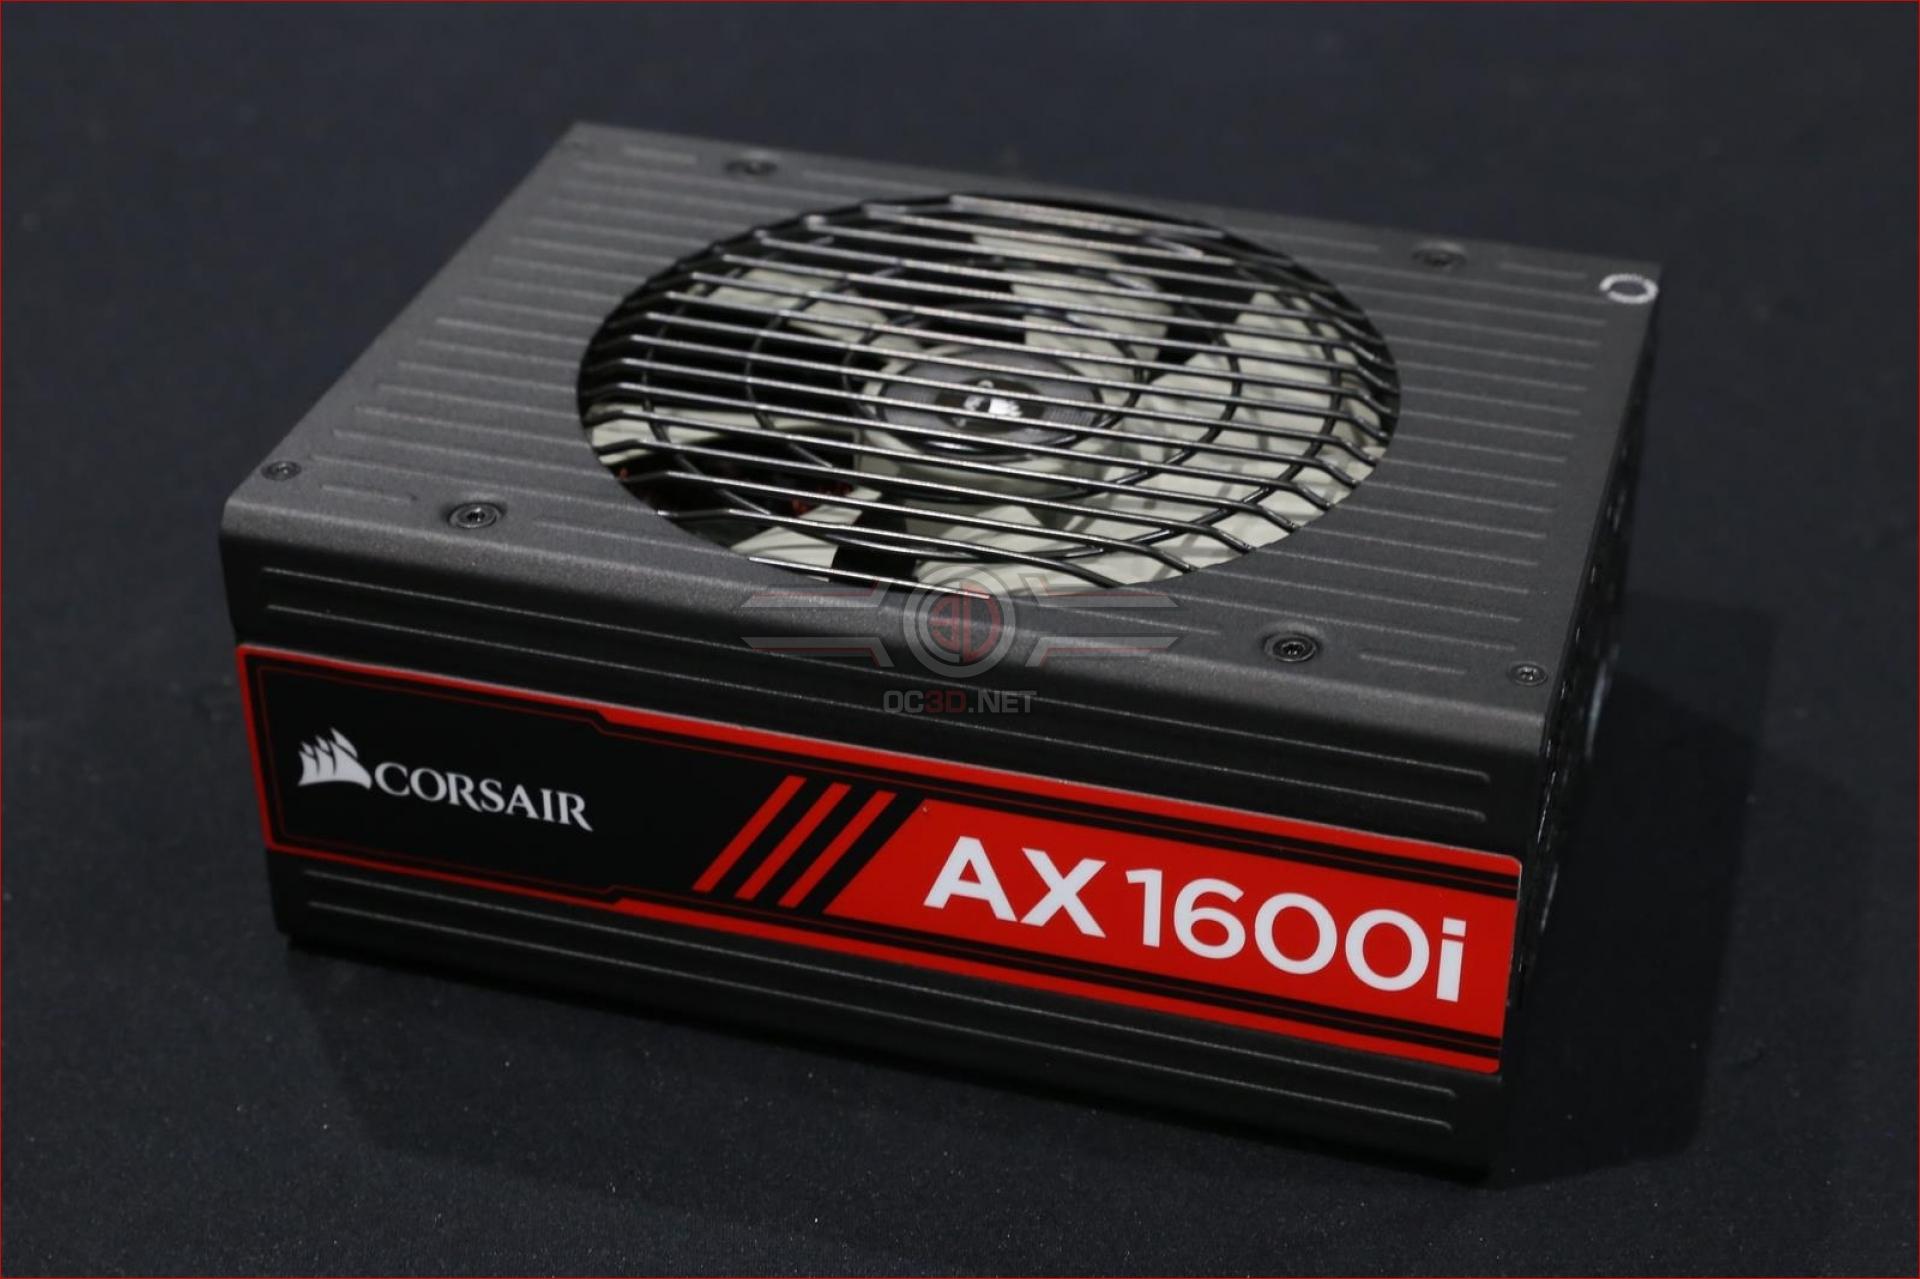 Corsair Ax1600i Psu Review Inside The Box A 1600w Psu